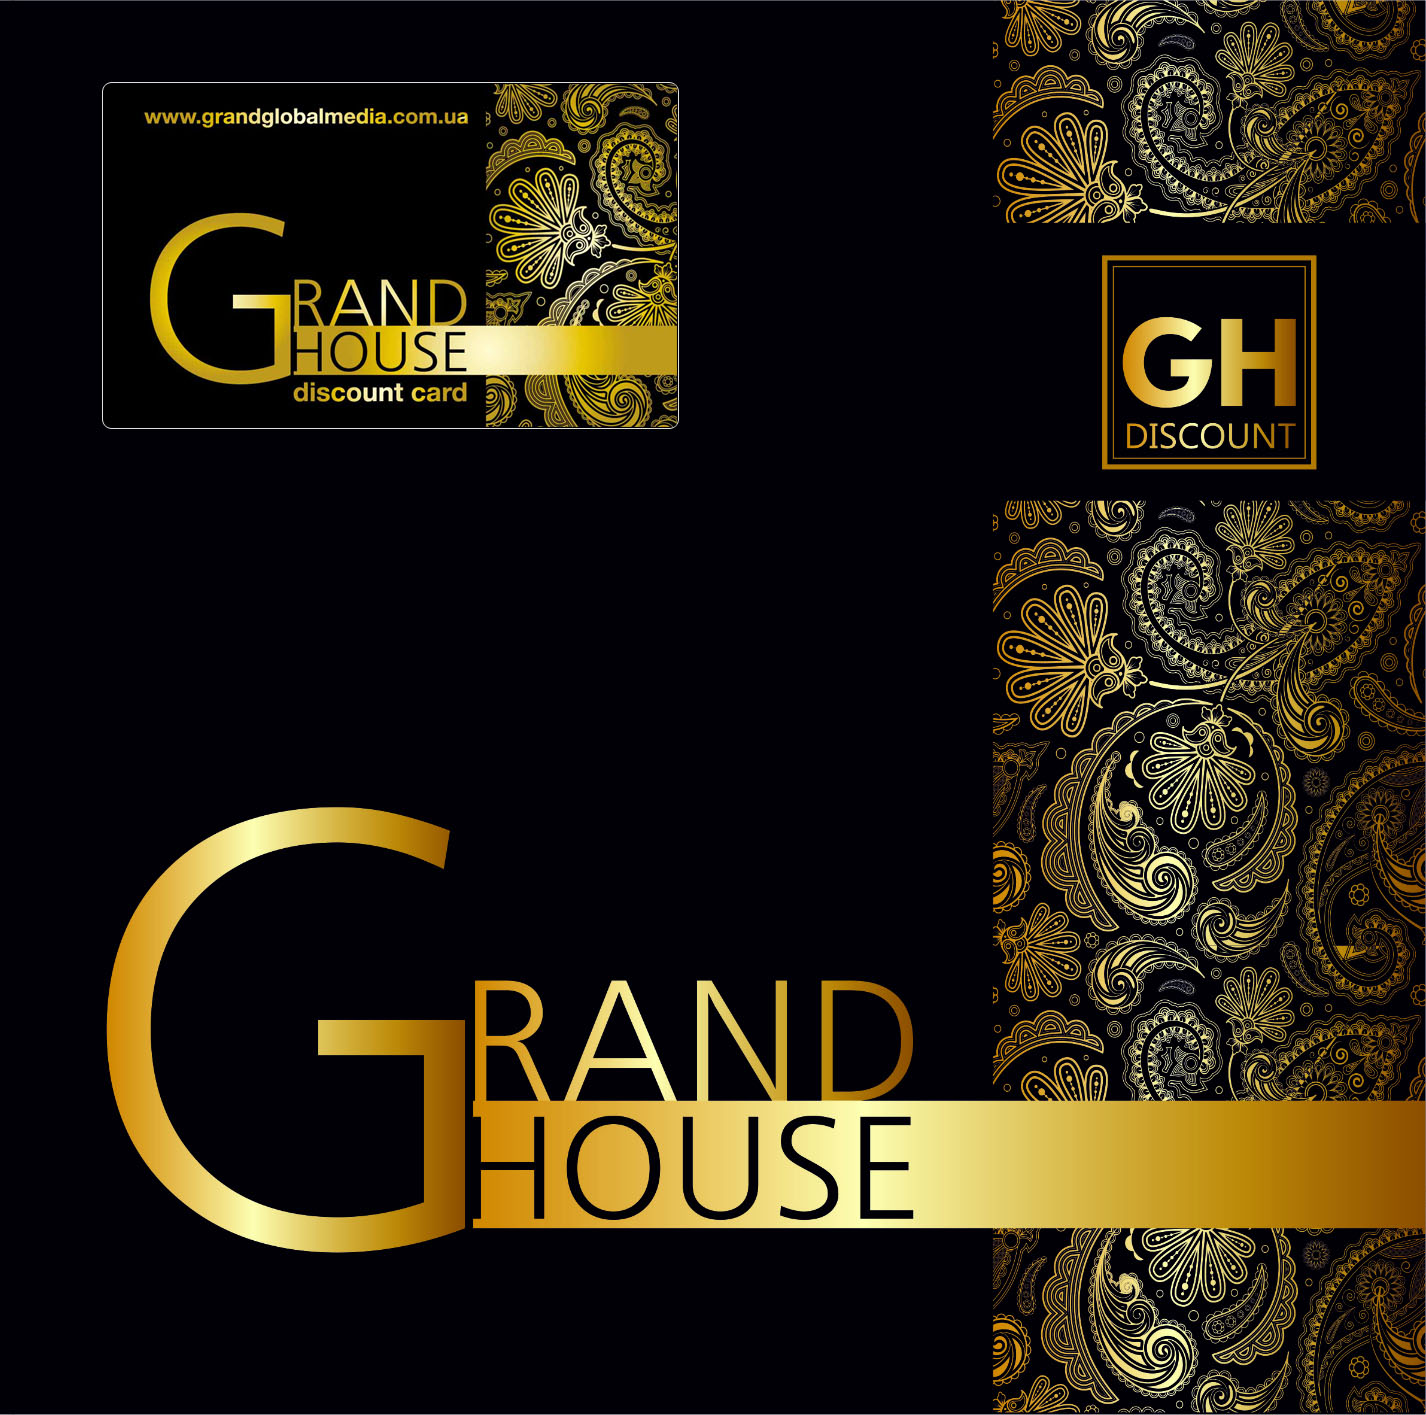 GRAND HOUSE 2016 КИЕВ